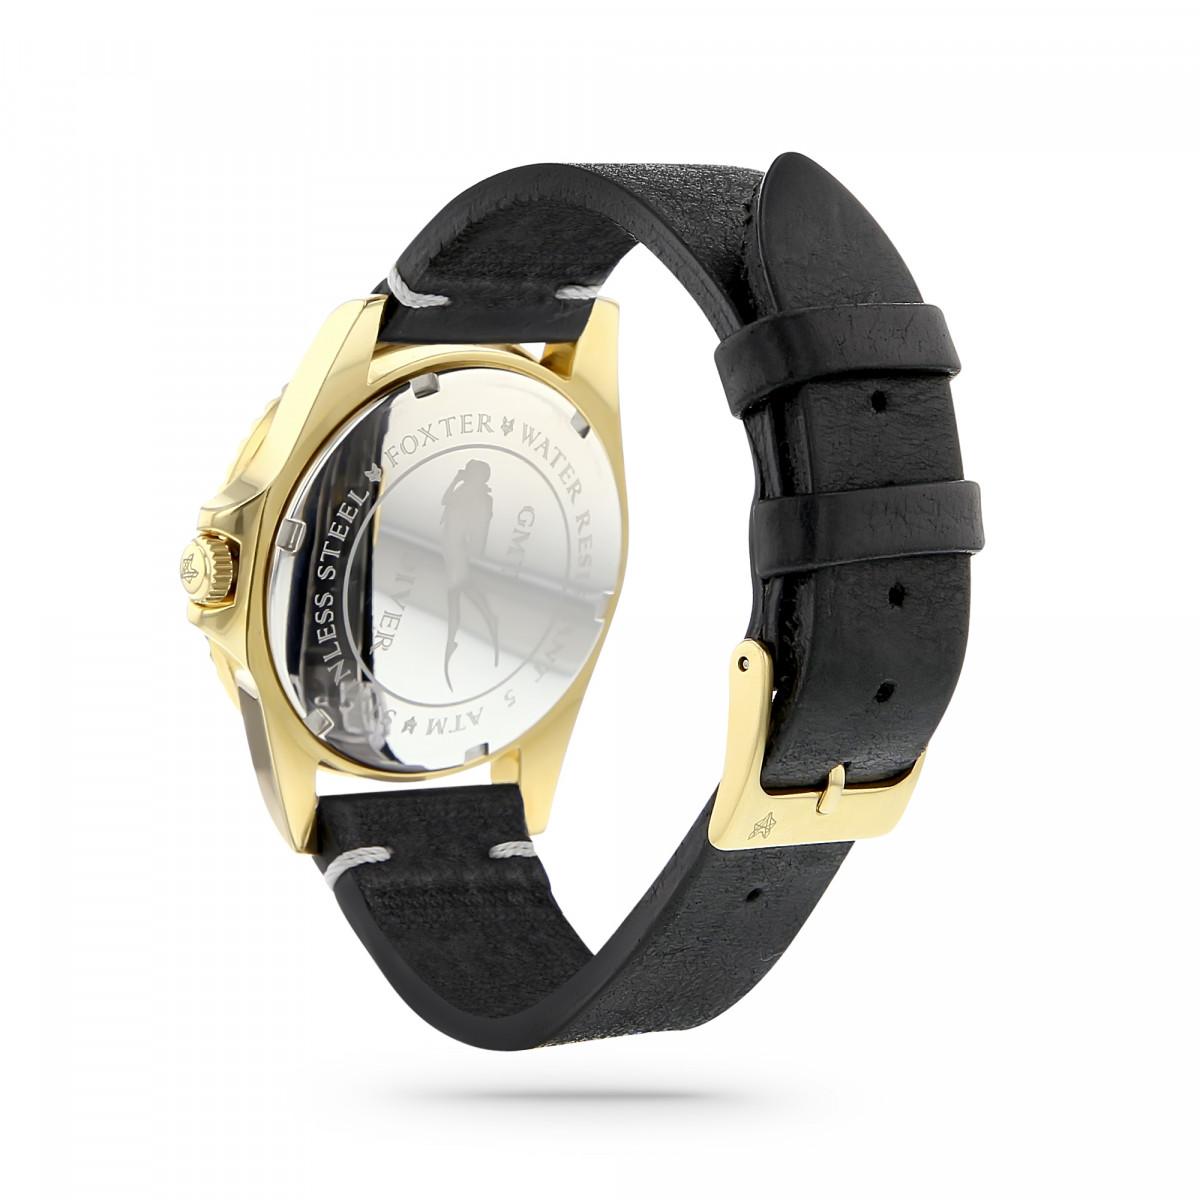 montre homme bracelet cuir or